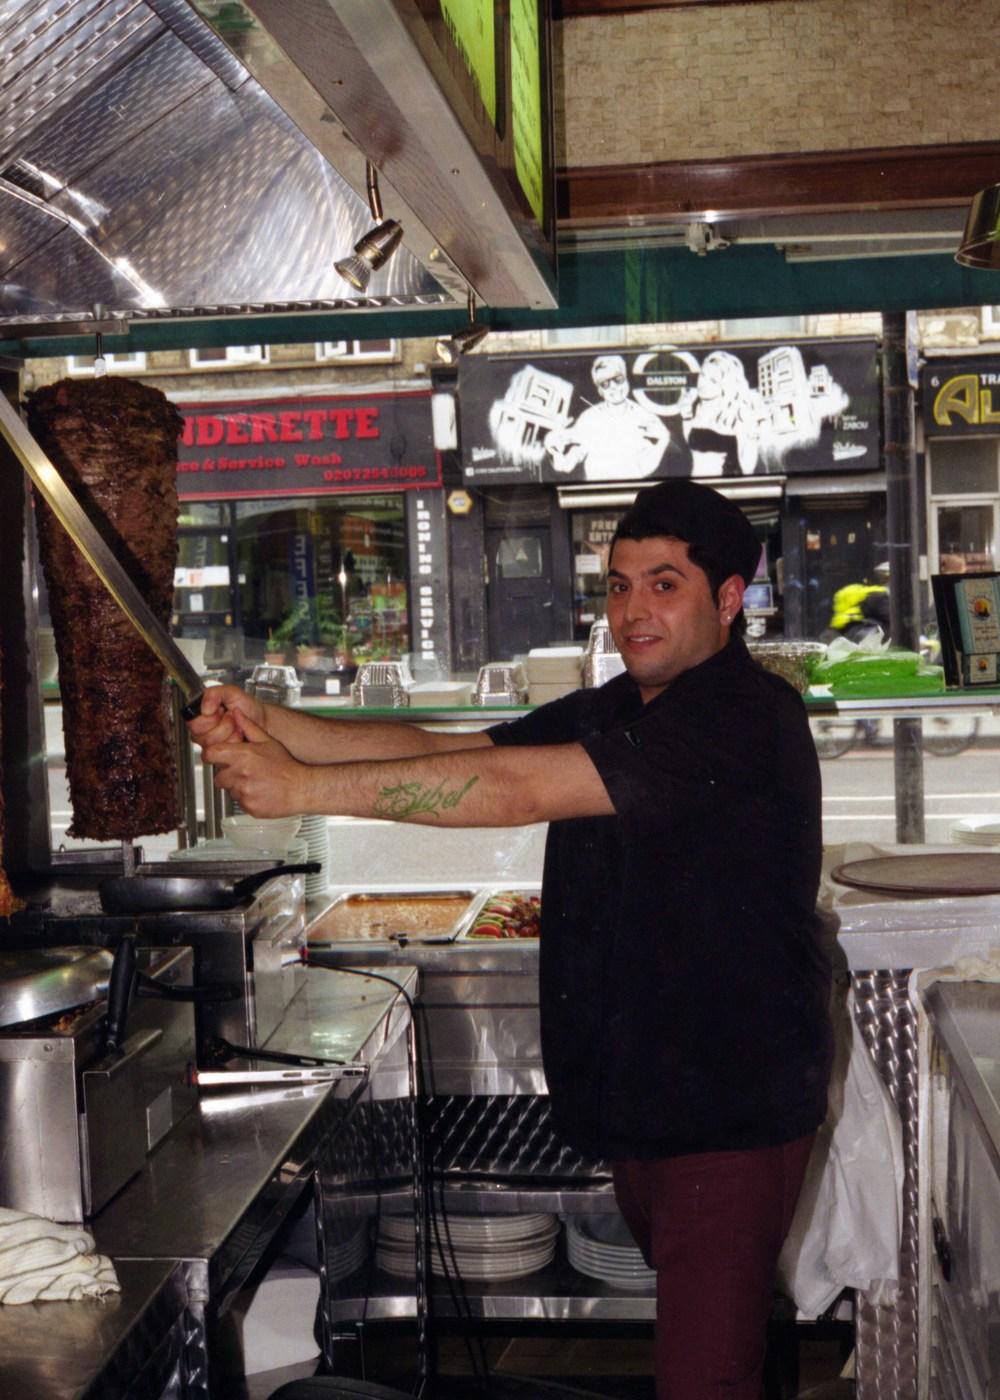 chef_1 8.jpg